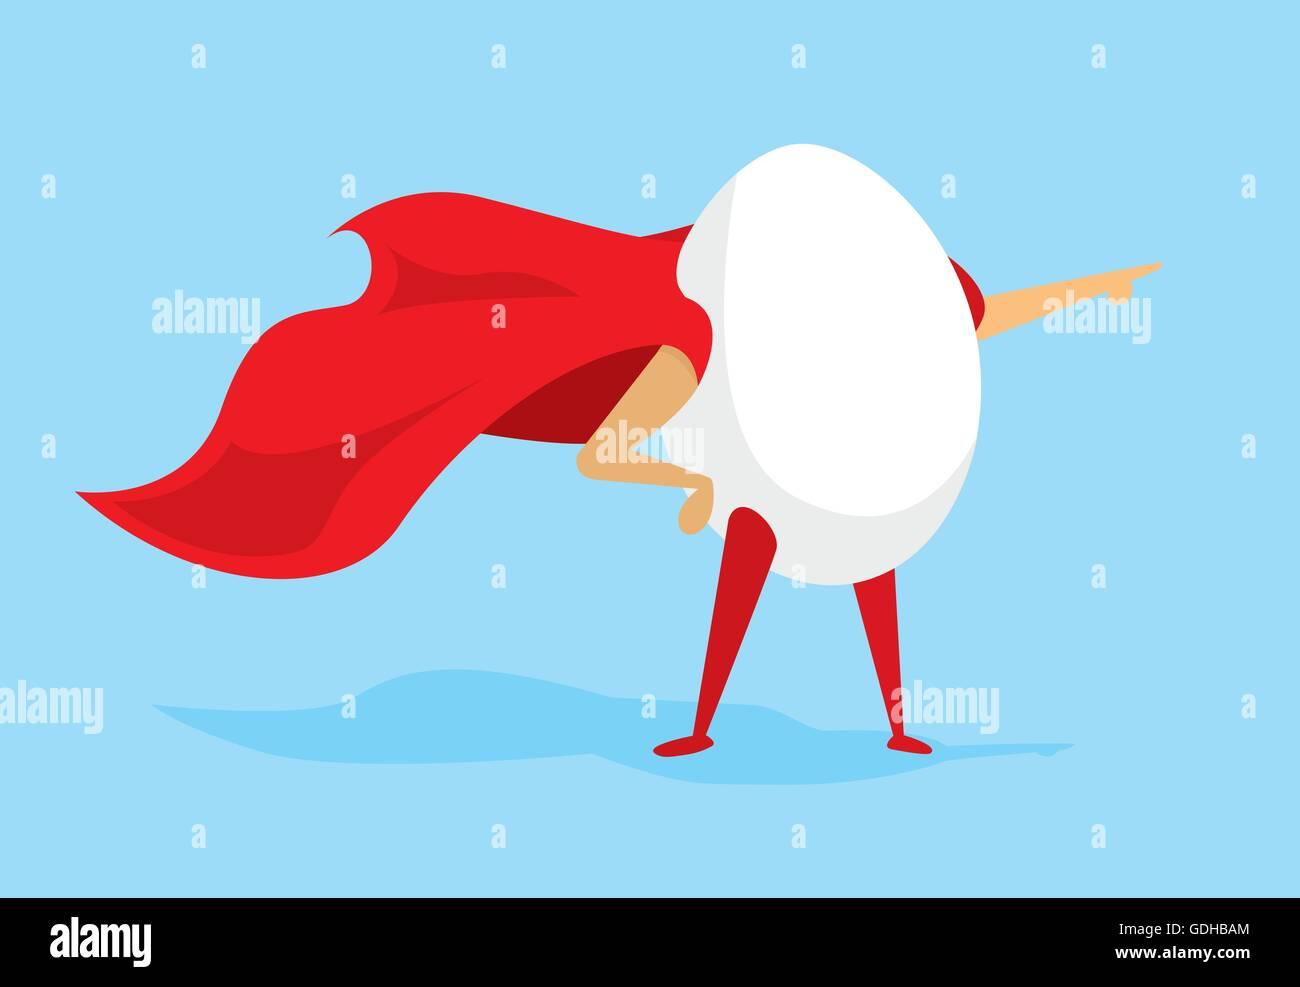 Cartoon illustration of egg super hero with cape - Stock Image